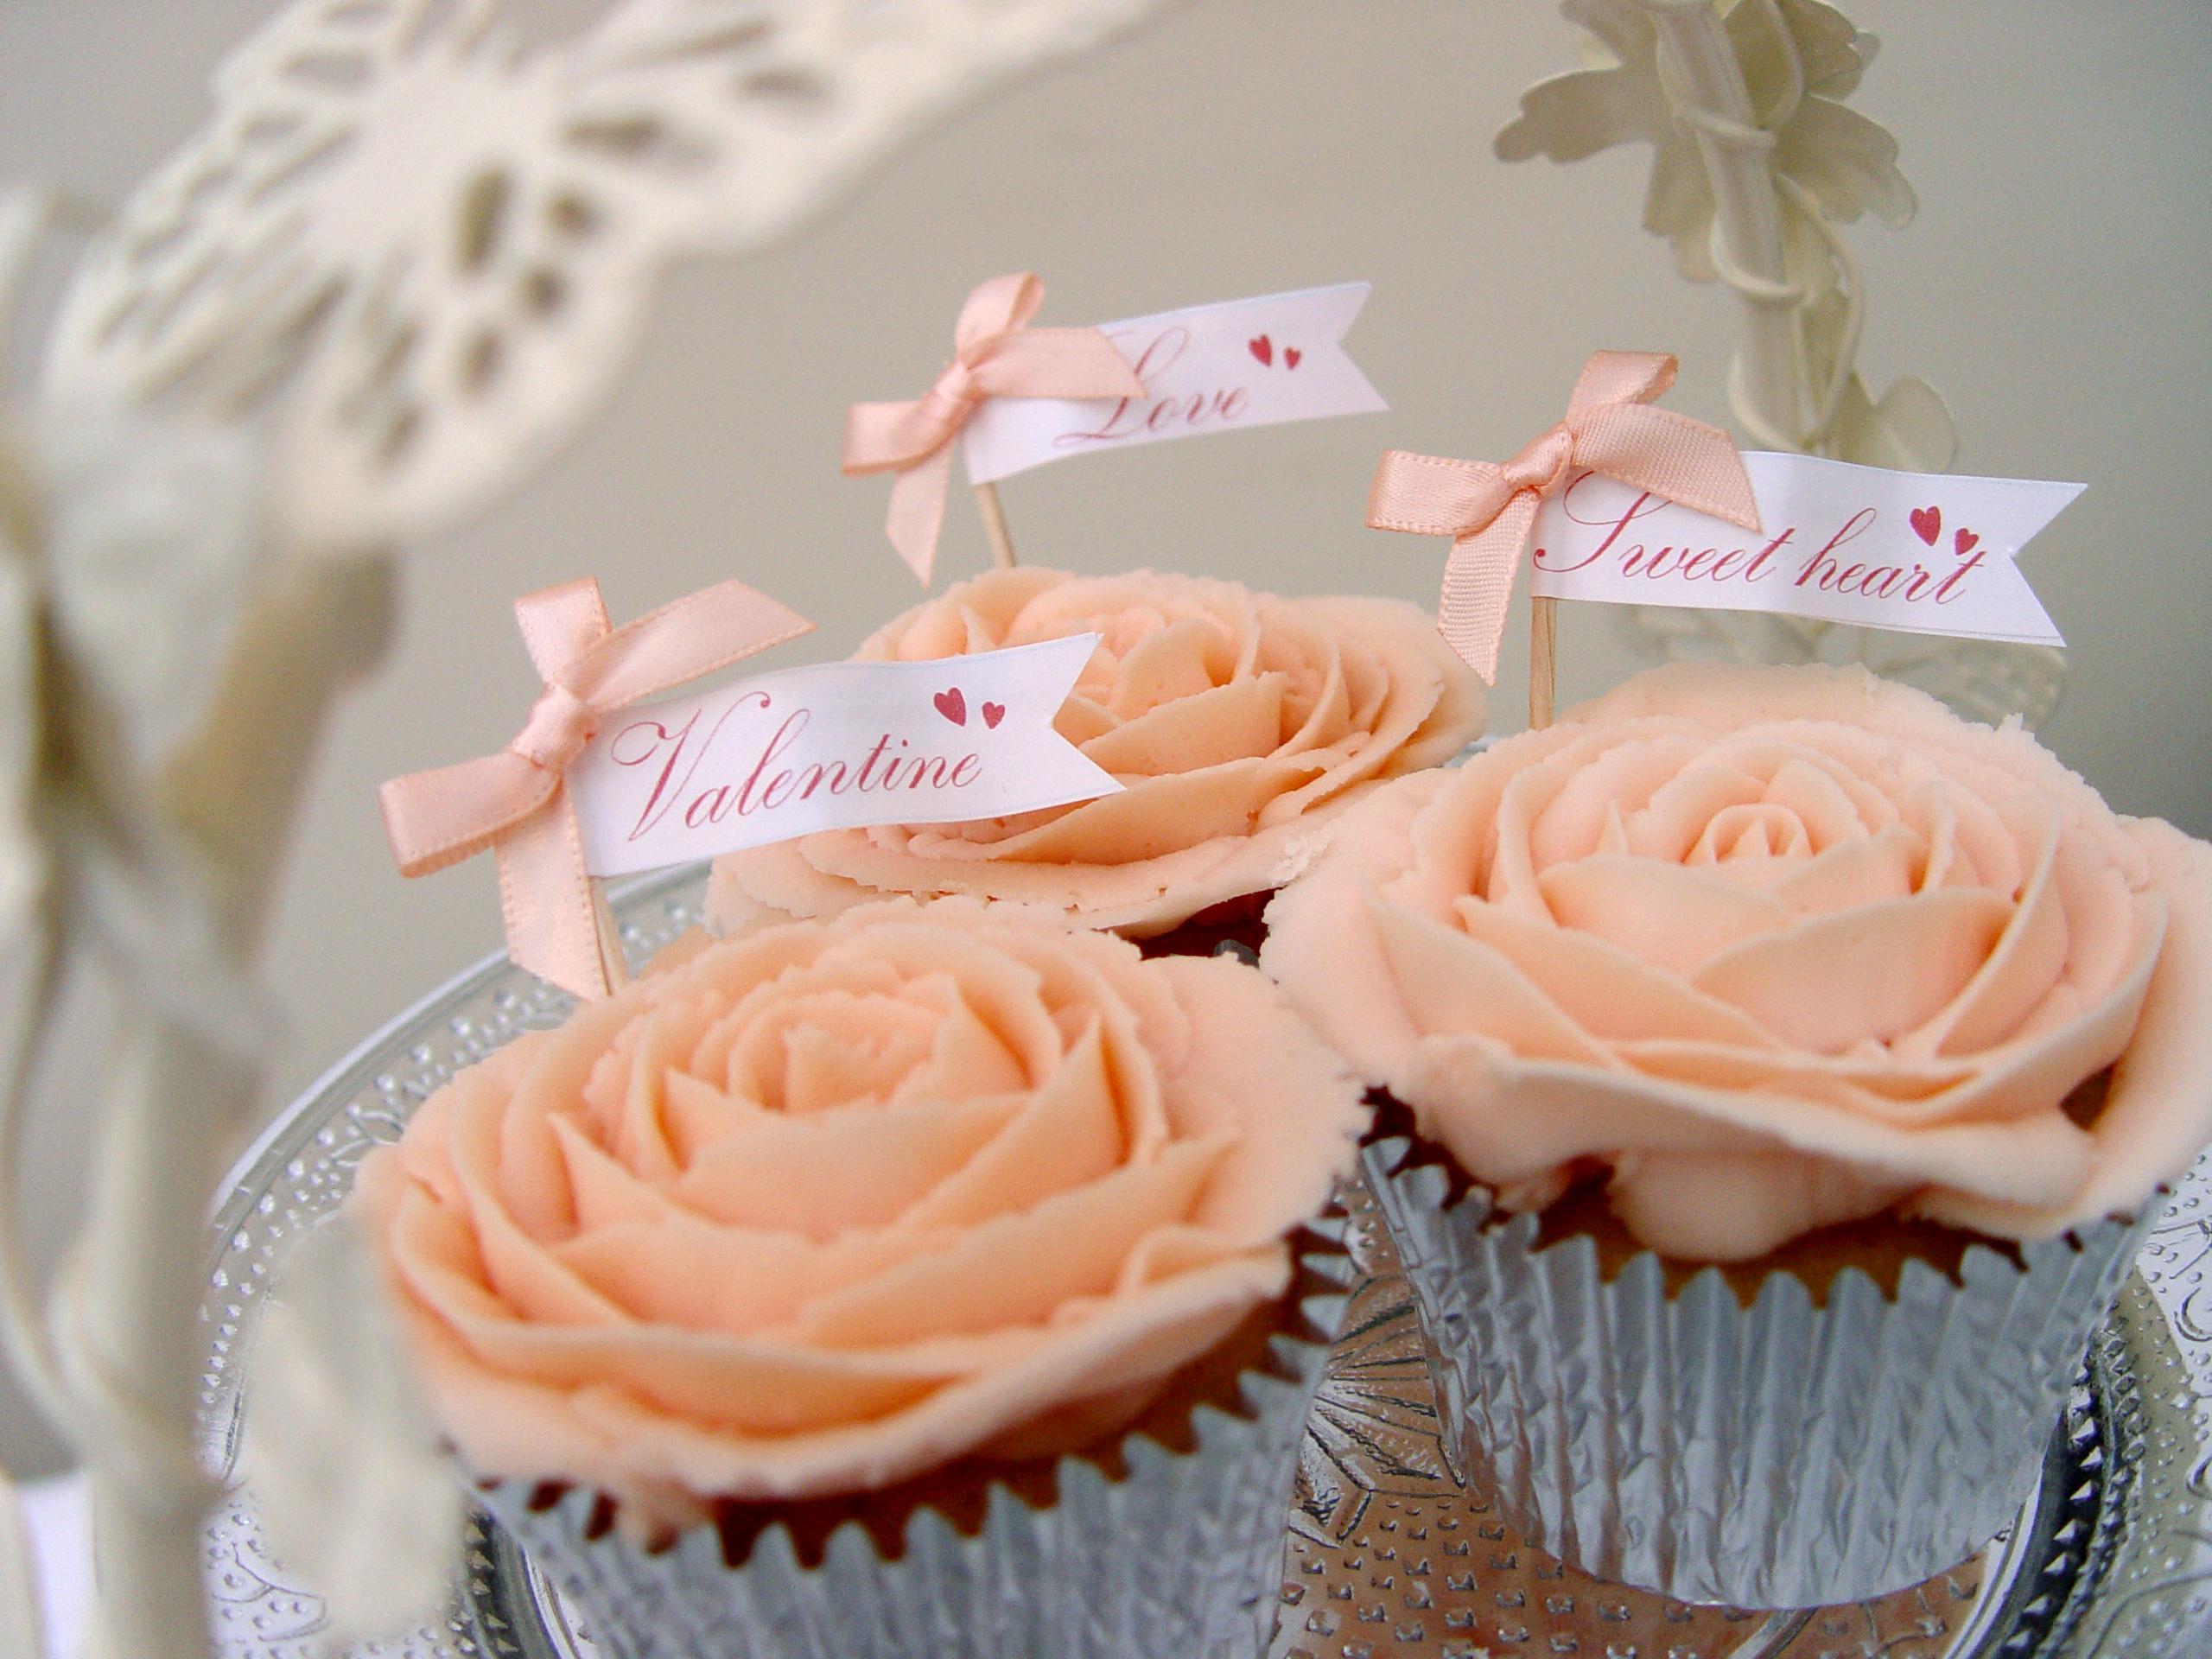 Valentine's Day Cupcakes Cake